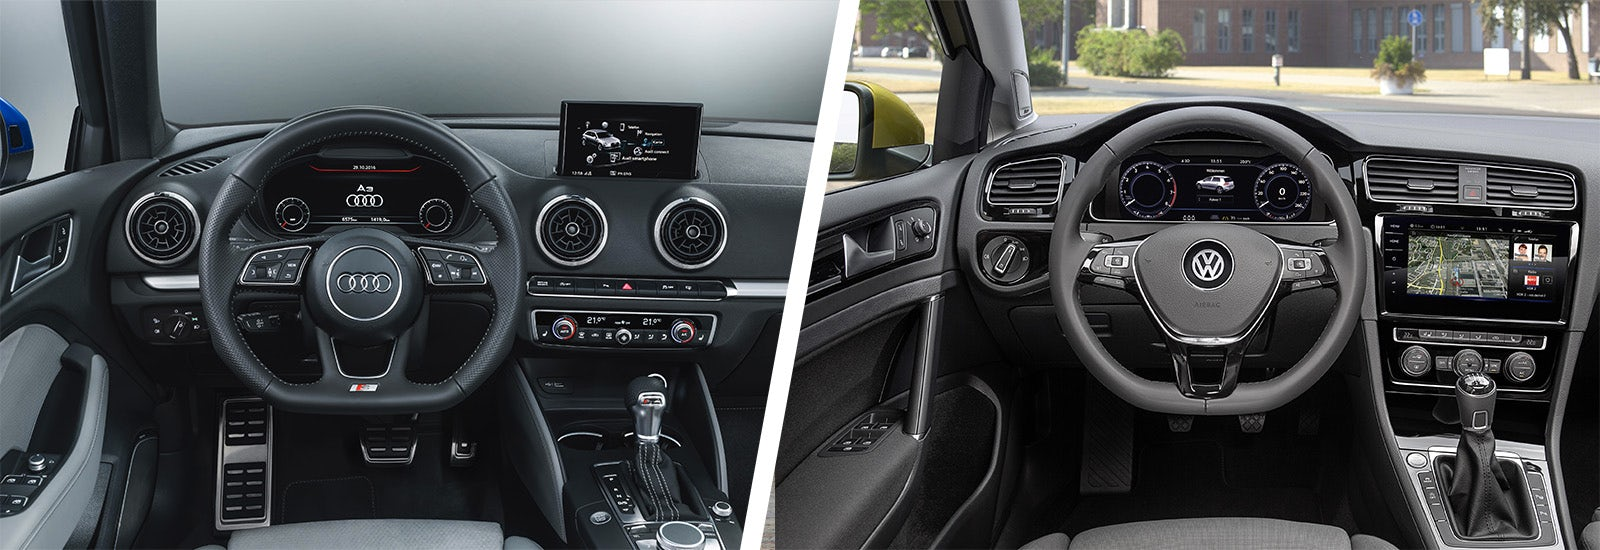 Audi A3 vs VW Golf – side-by-side comparison | carwow